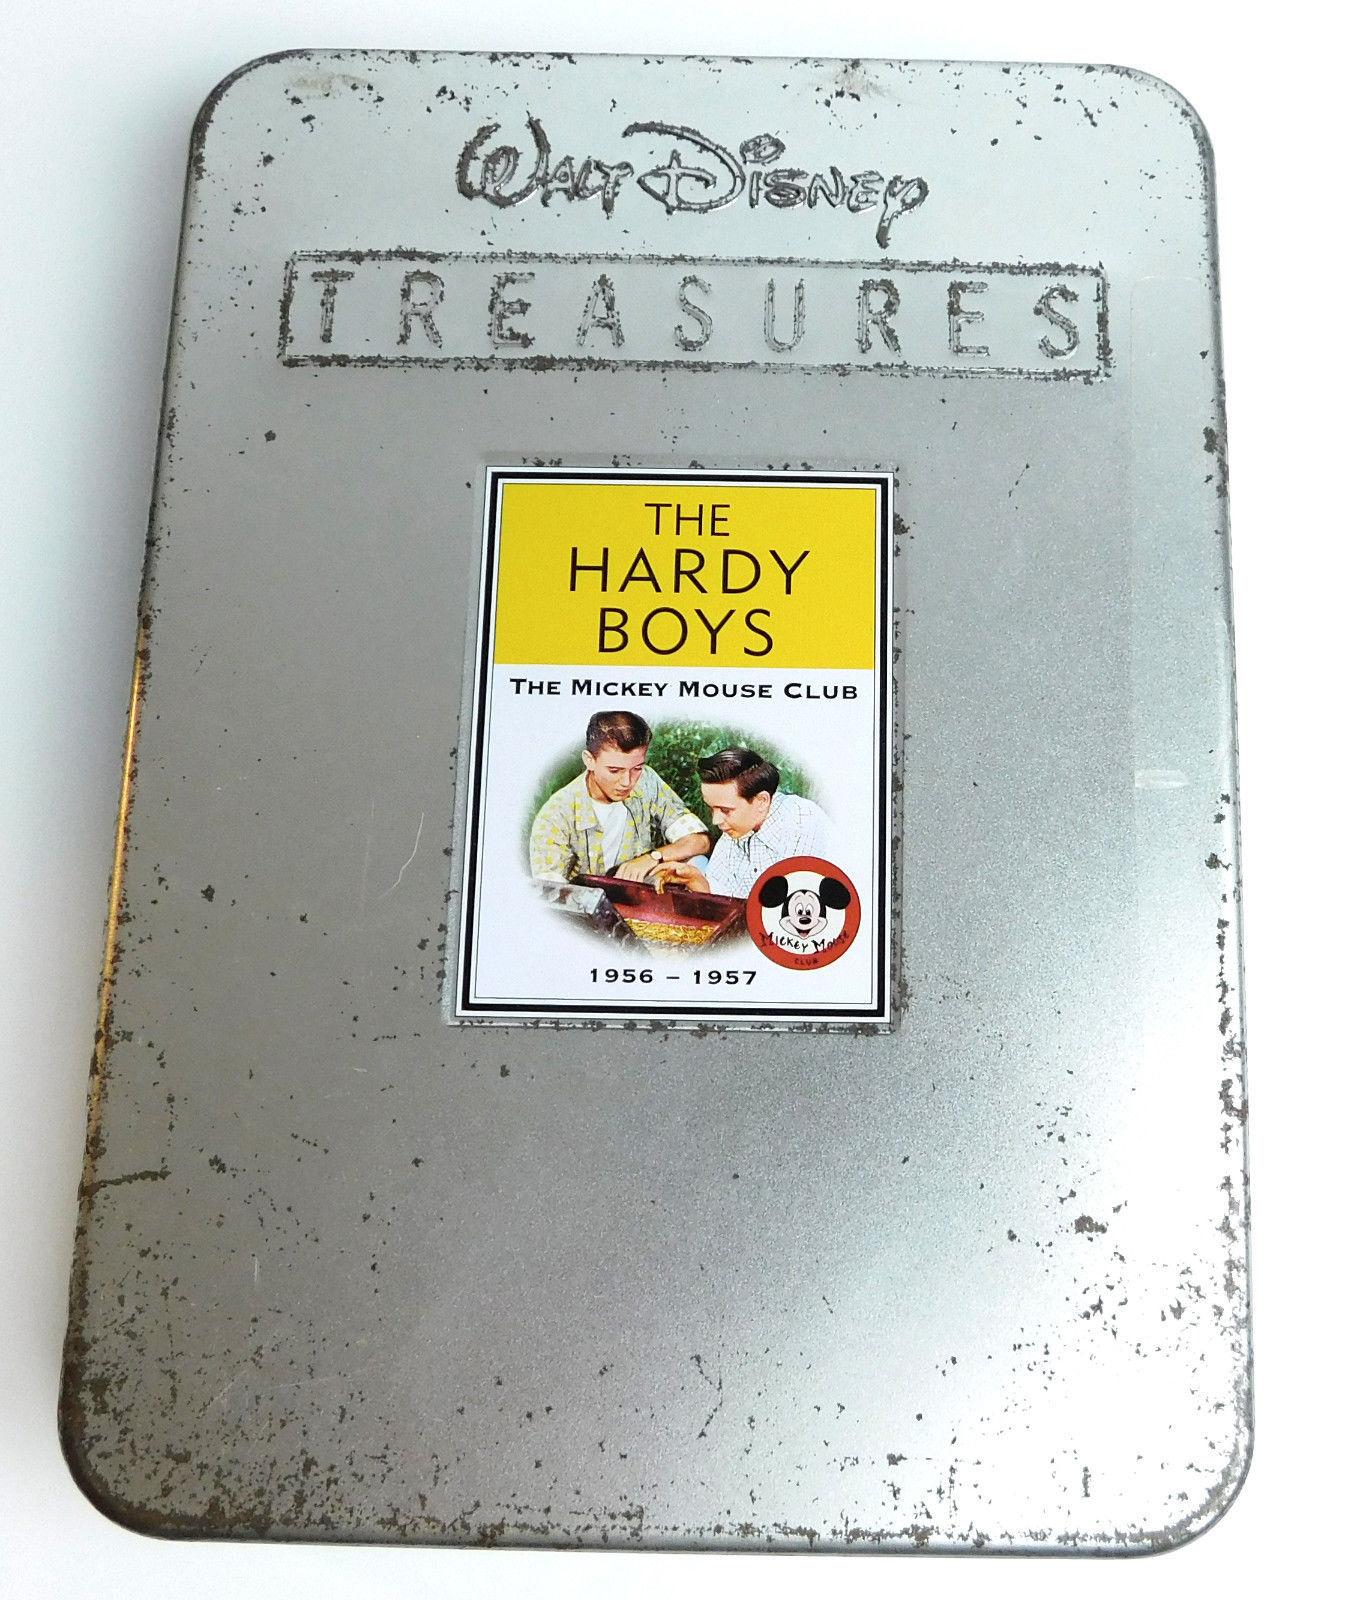 Walt Disney Treasures Hardy Boys 1956-1957 Mickey Mouse Club 2 DVD w/ COA